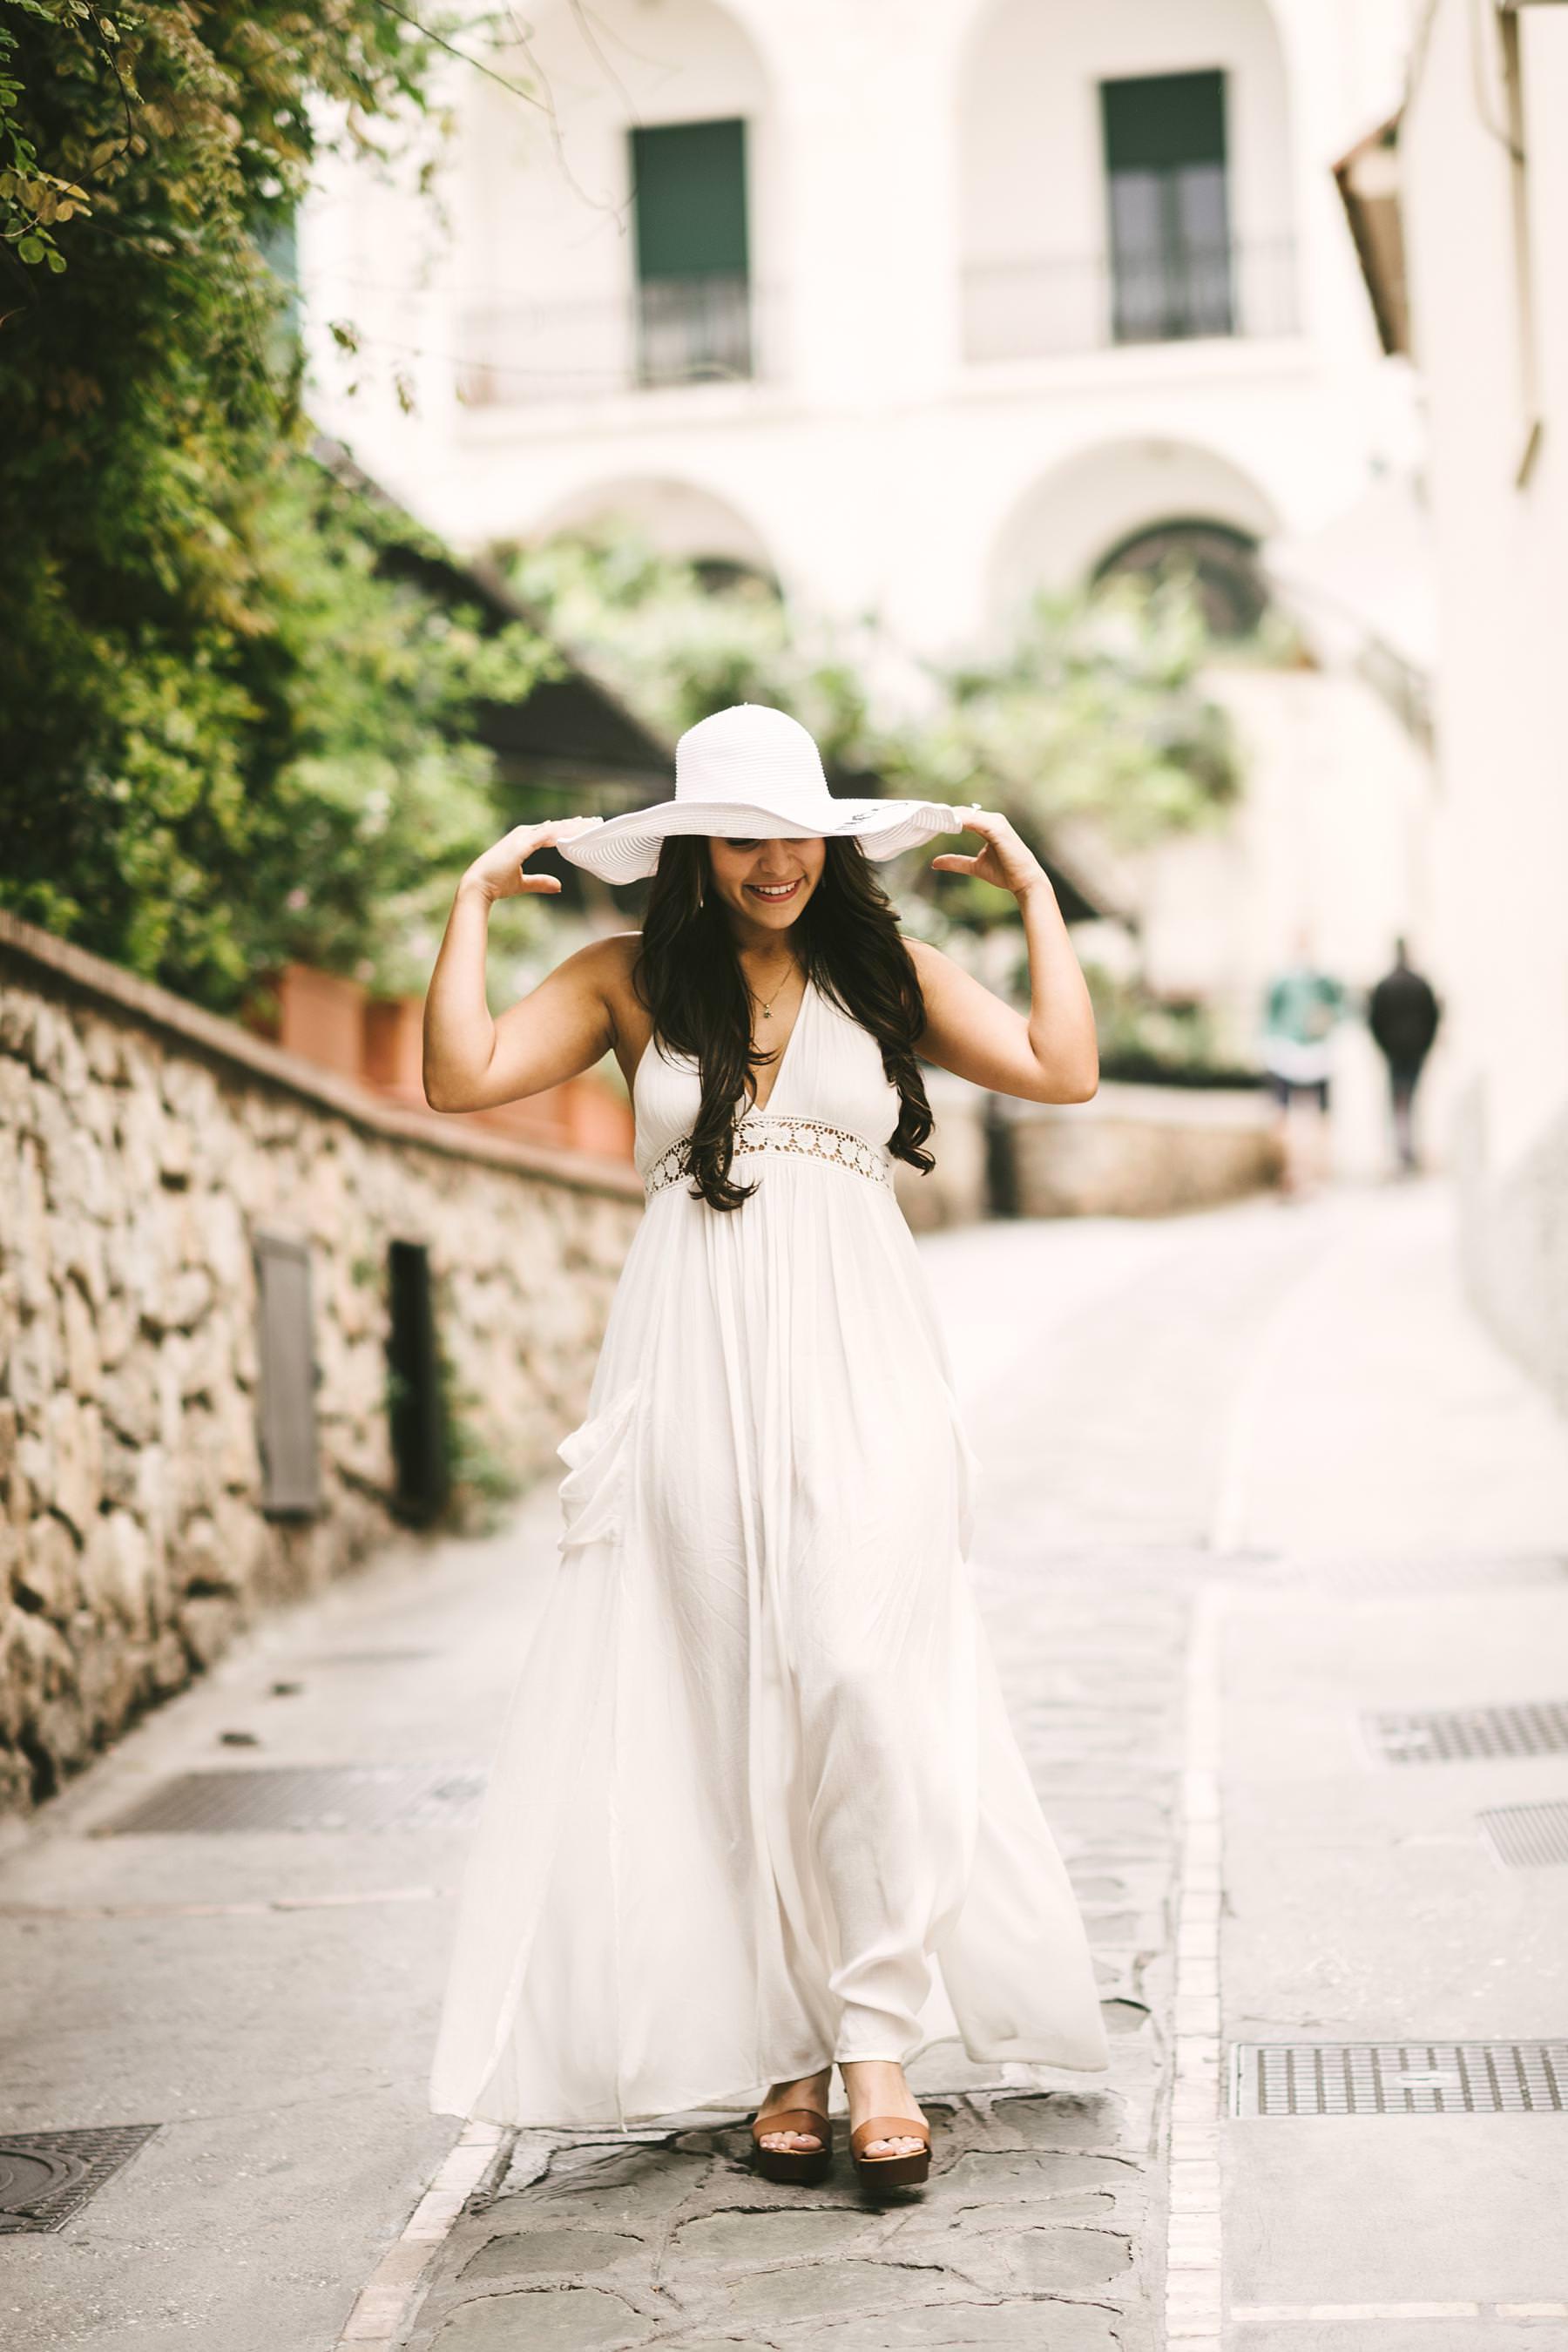 Exciting and elegant couple portrait photo shoot in Capri island